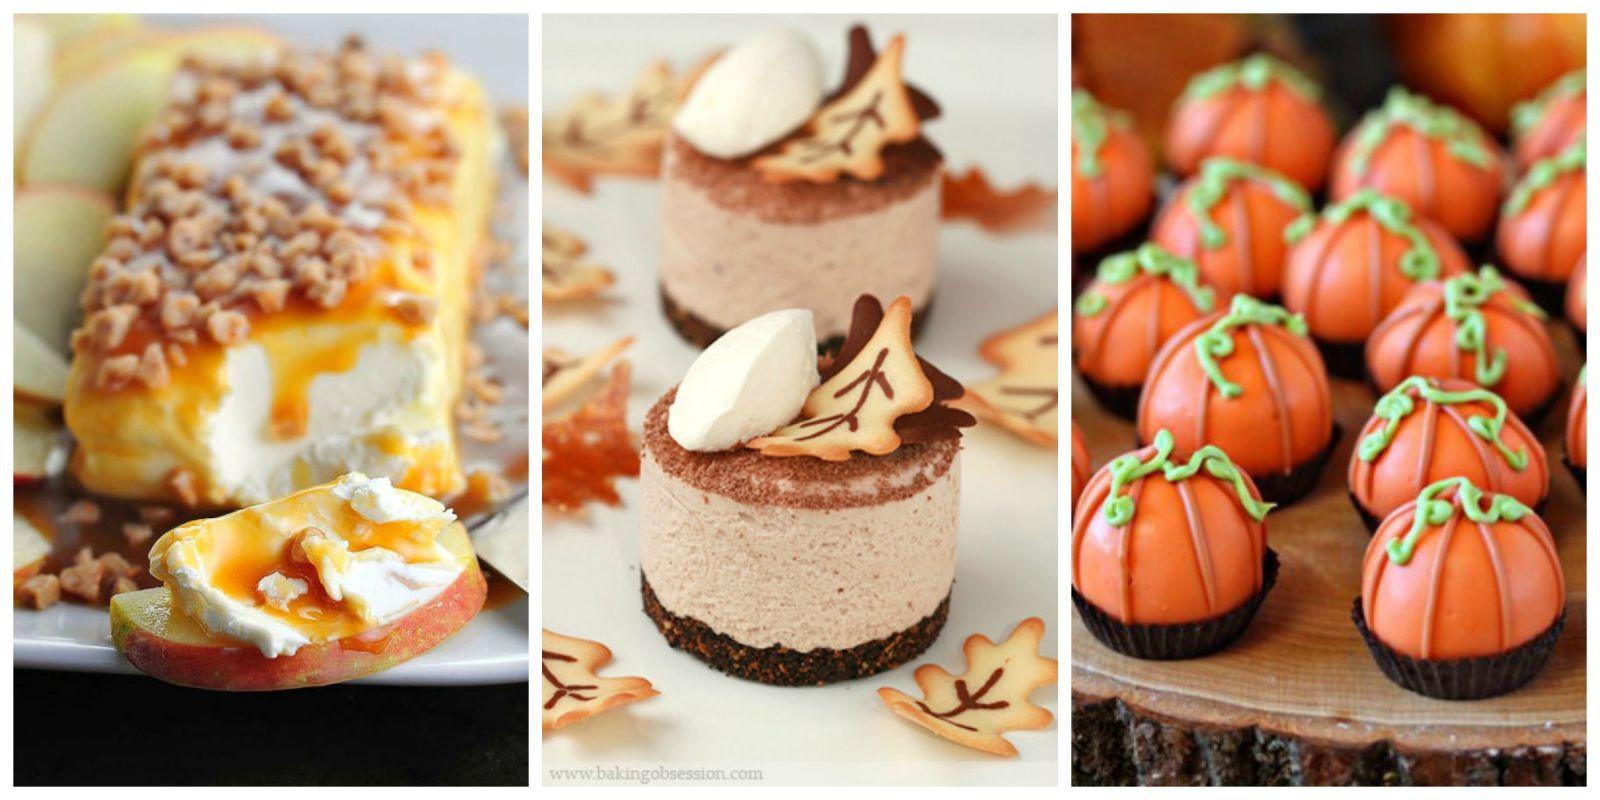 Fall Desserts Recipes  35 Easy Fall Dessert Recipes Best Treats for Autumn Parties